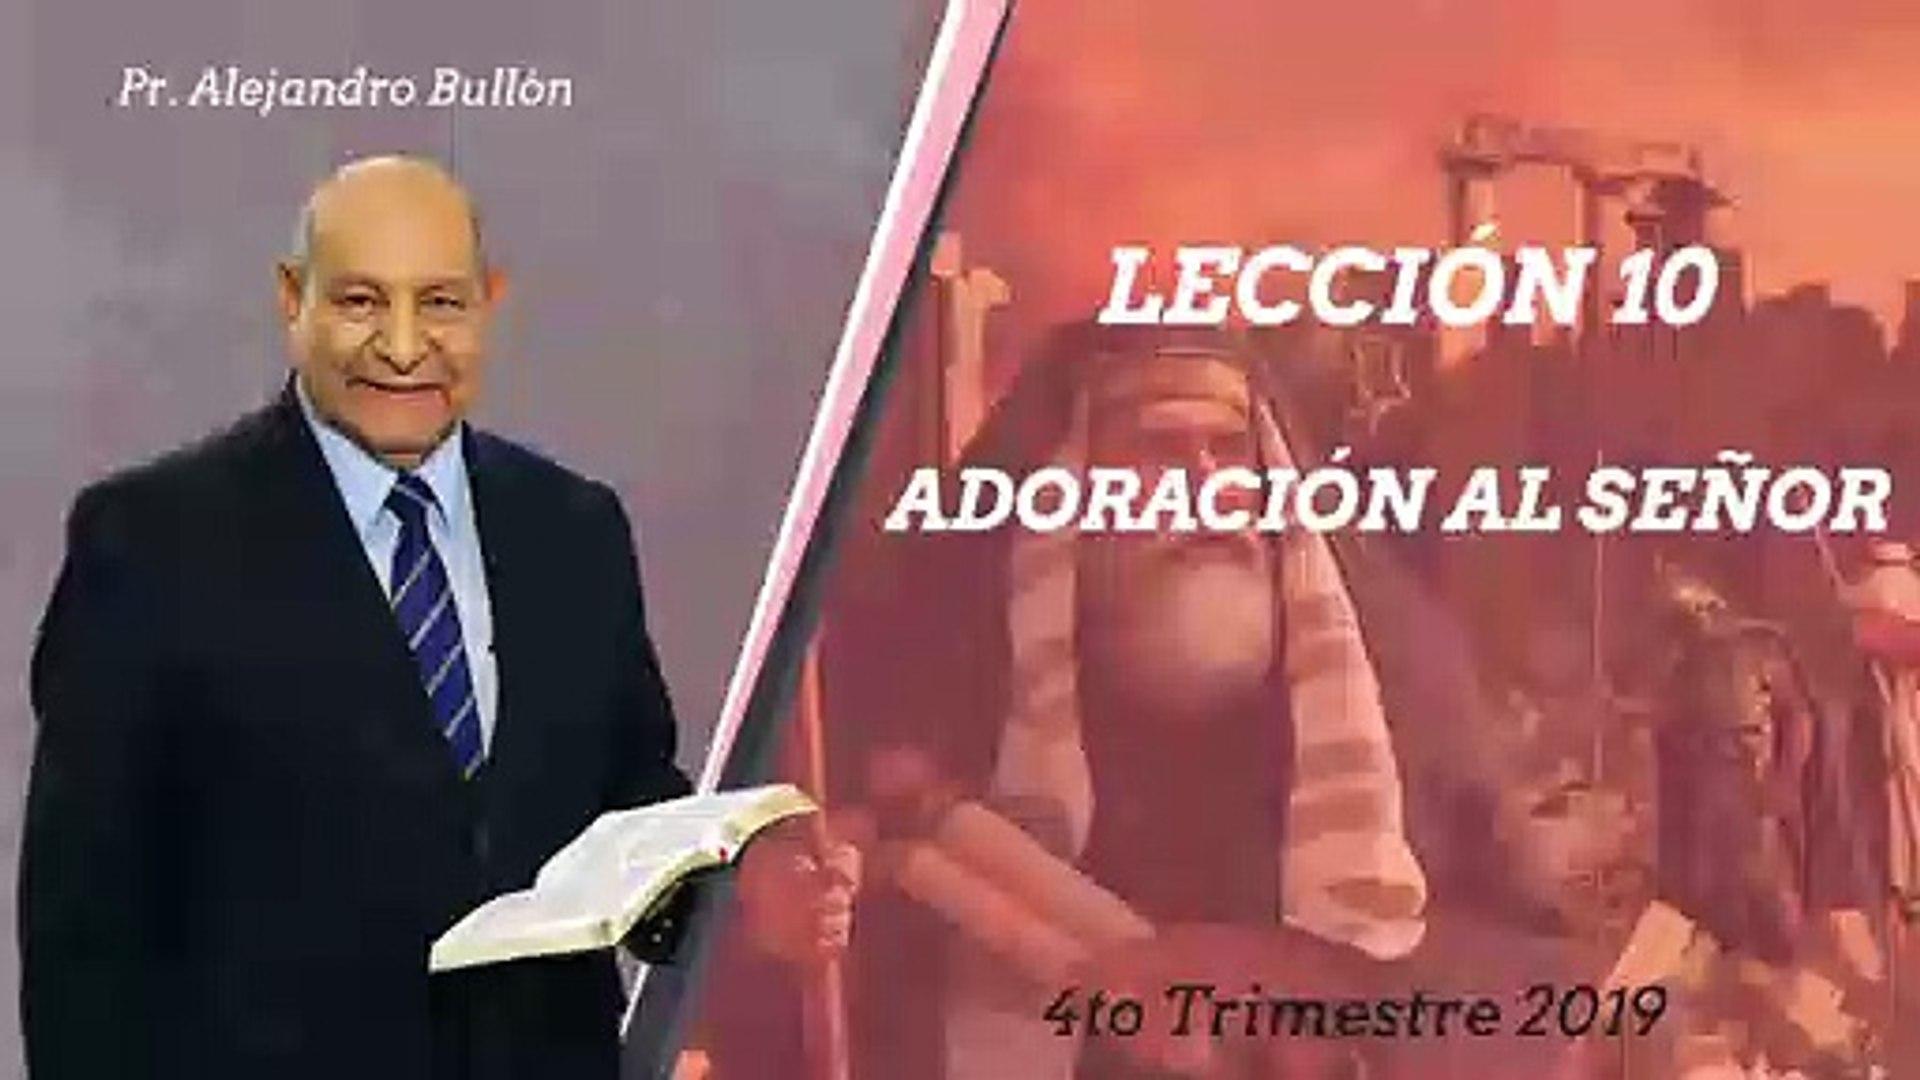 Lección 10: Adoración al Señor - Pr. Alejandro Bullón